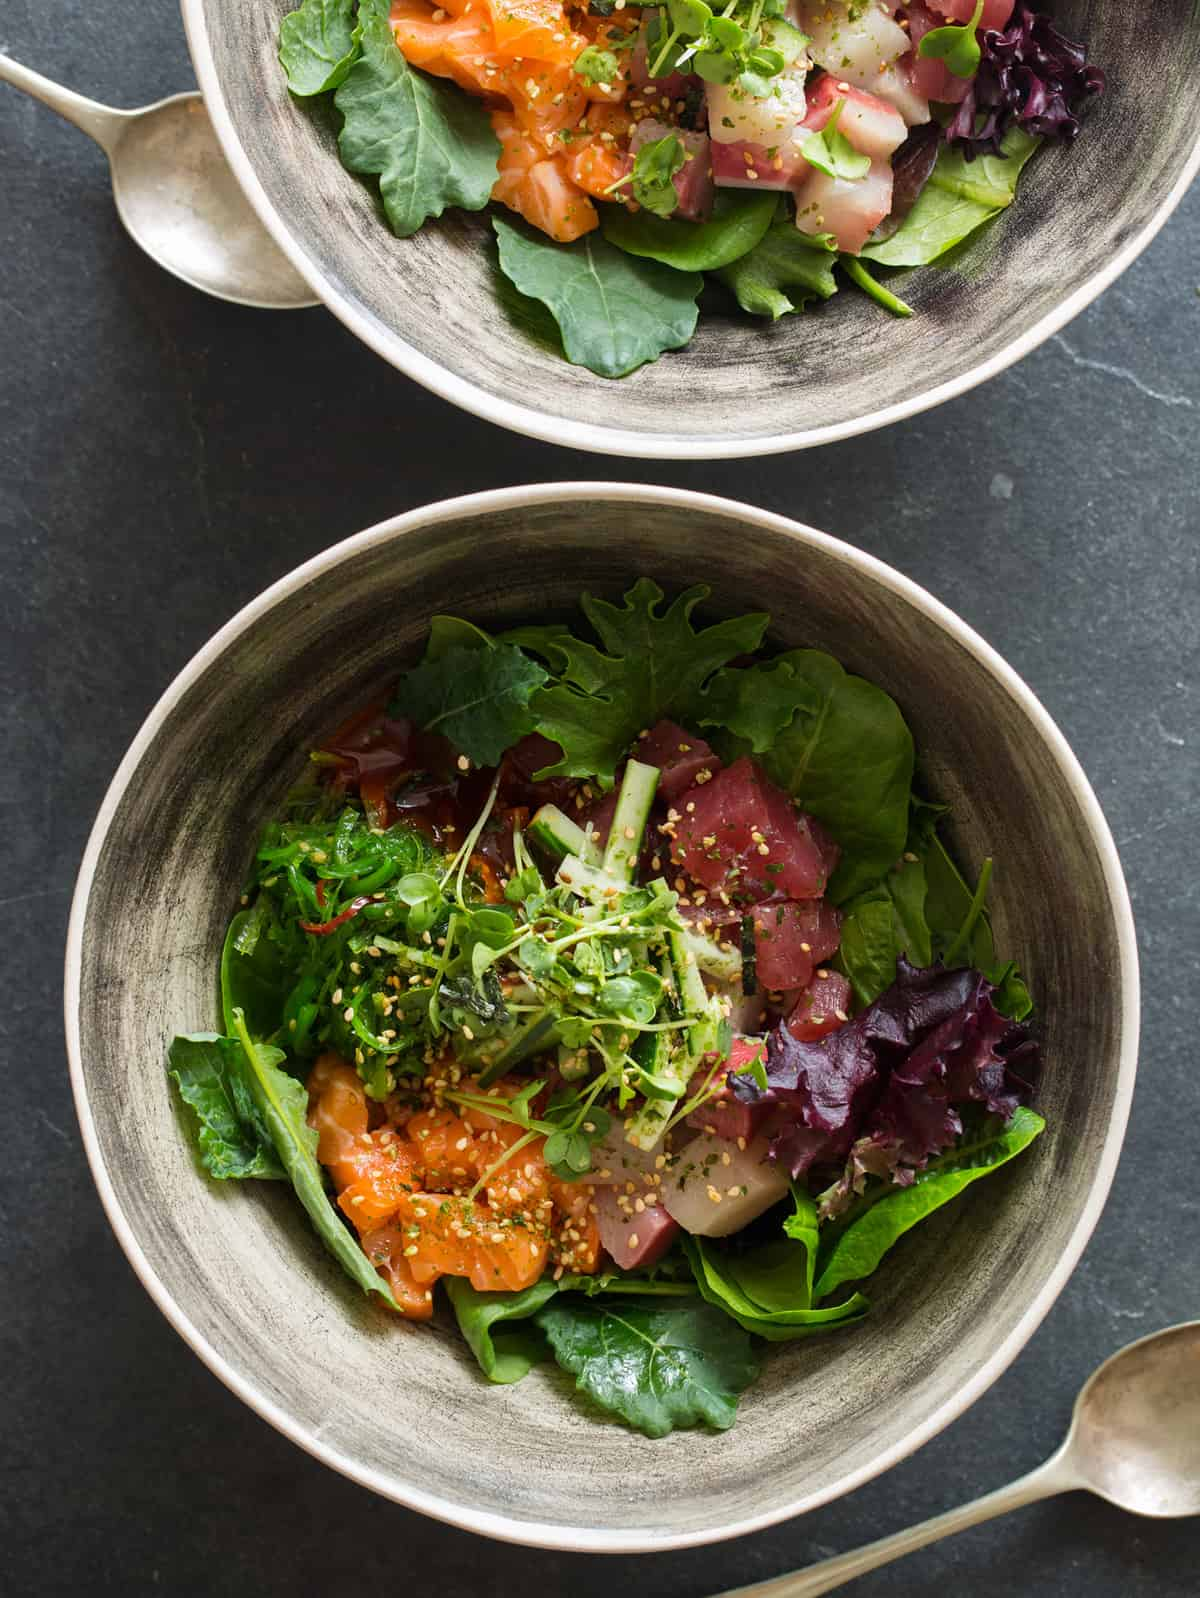 Korean spicy sashimi salad in gray bowls.